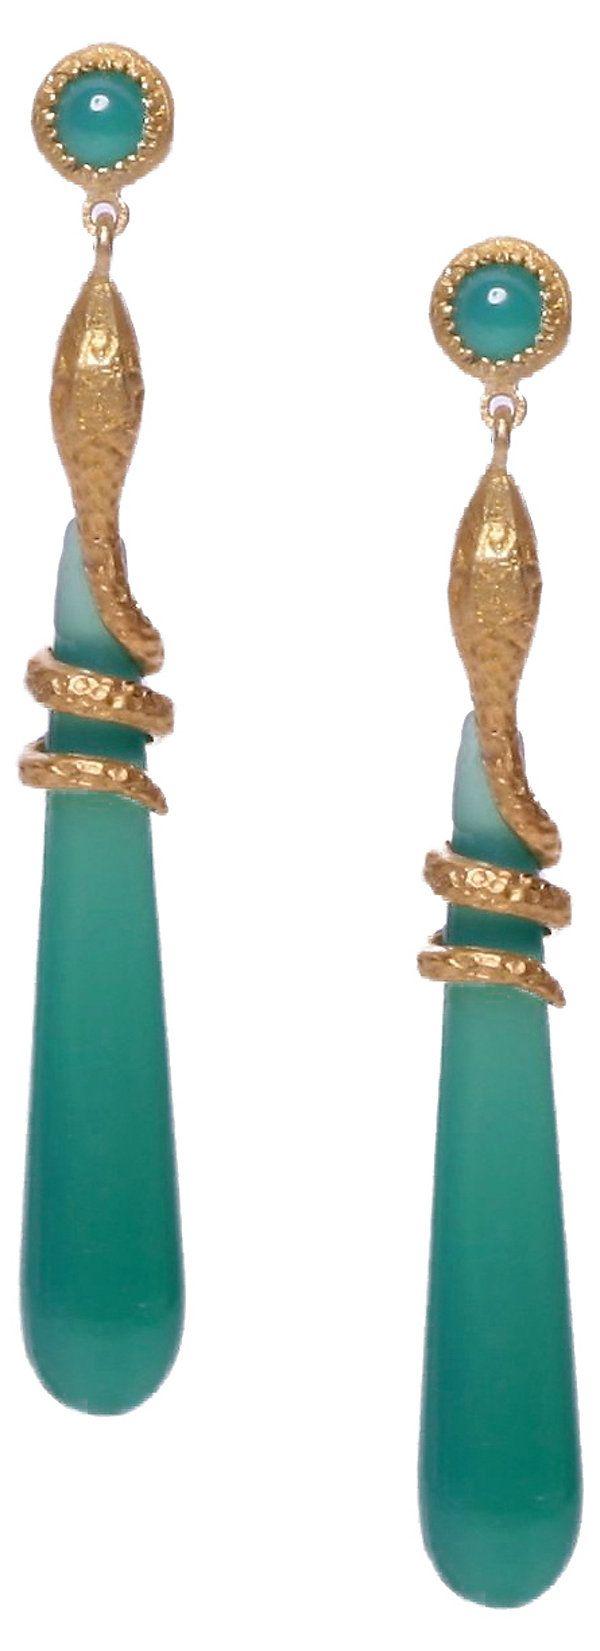 Snake Drop Earrings, Green Onyx | Most Wanted | One Kings Lane